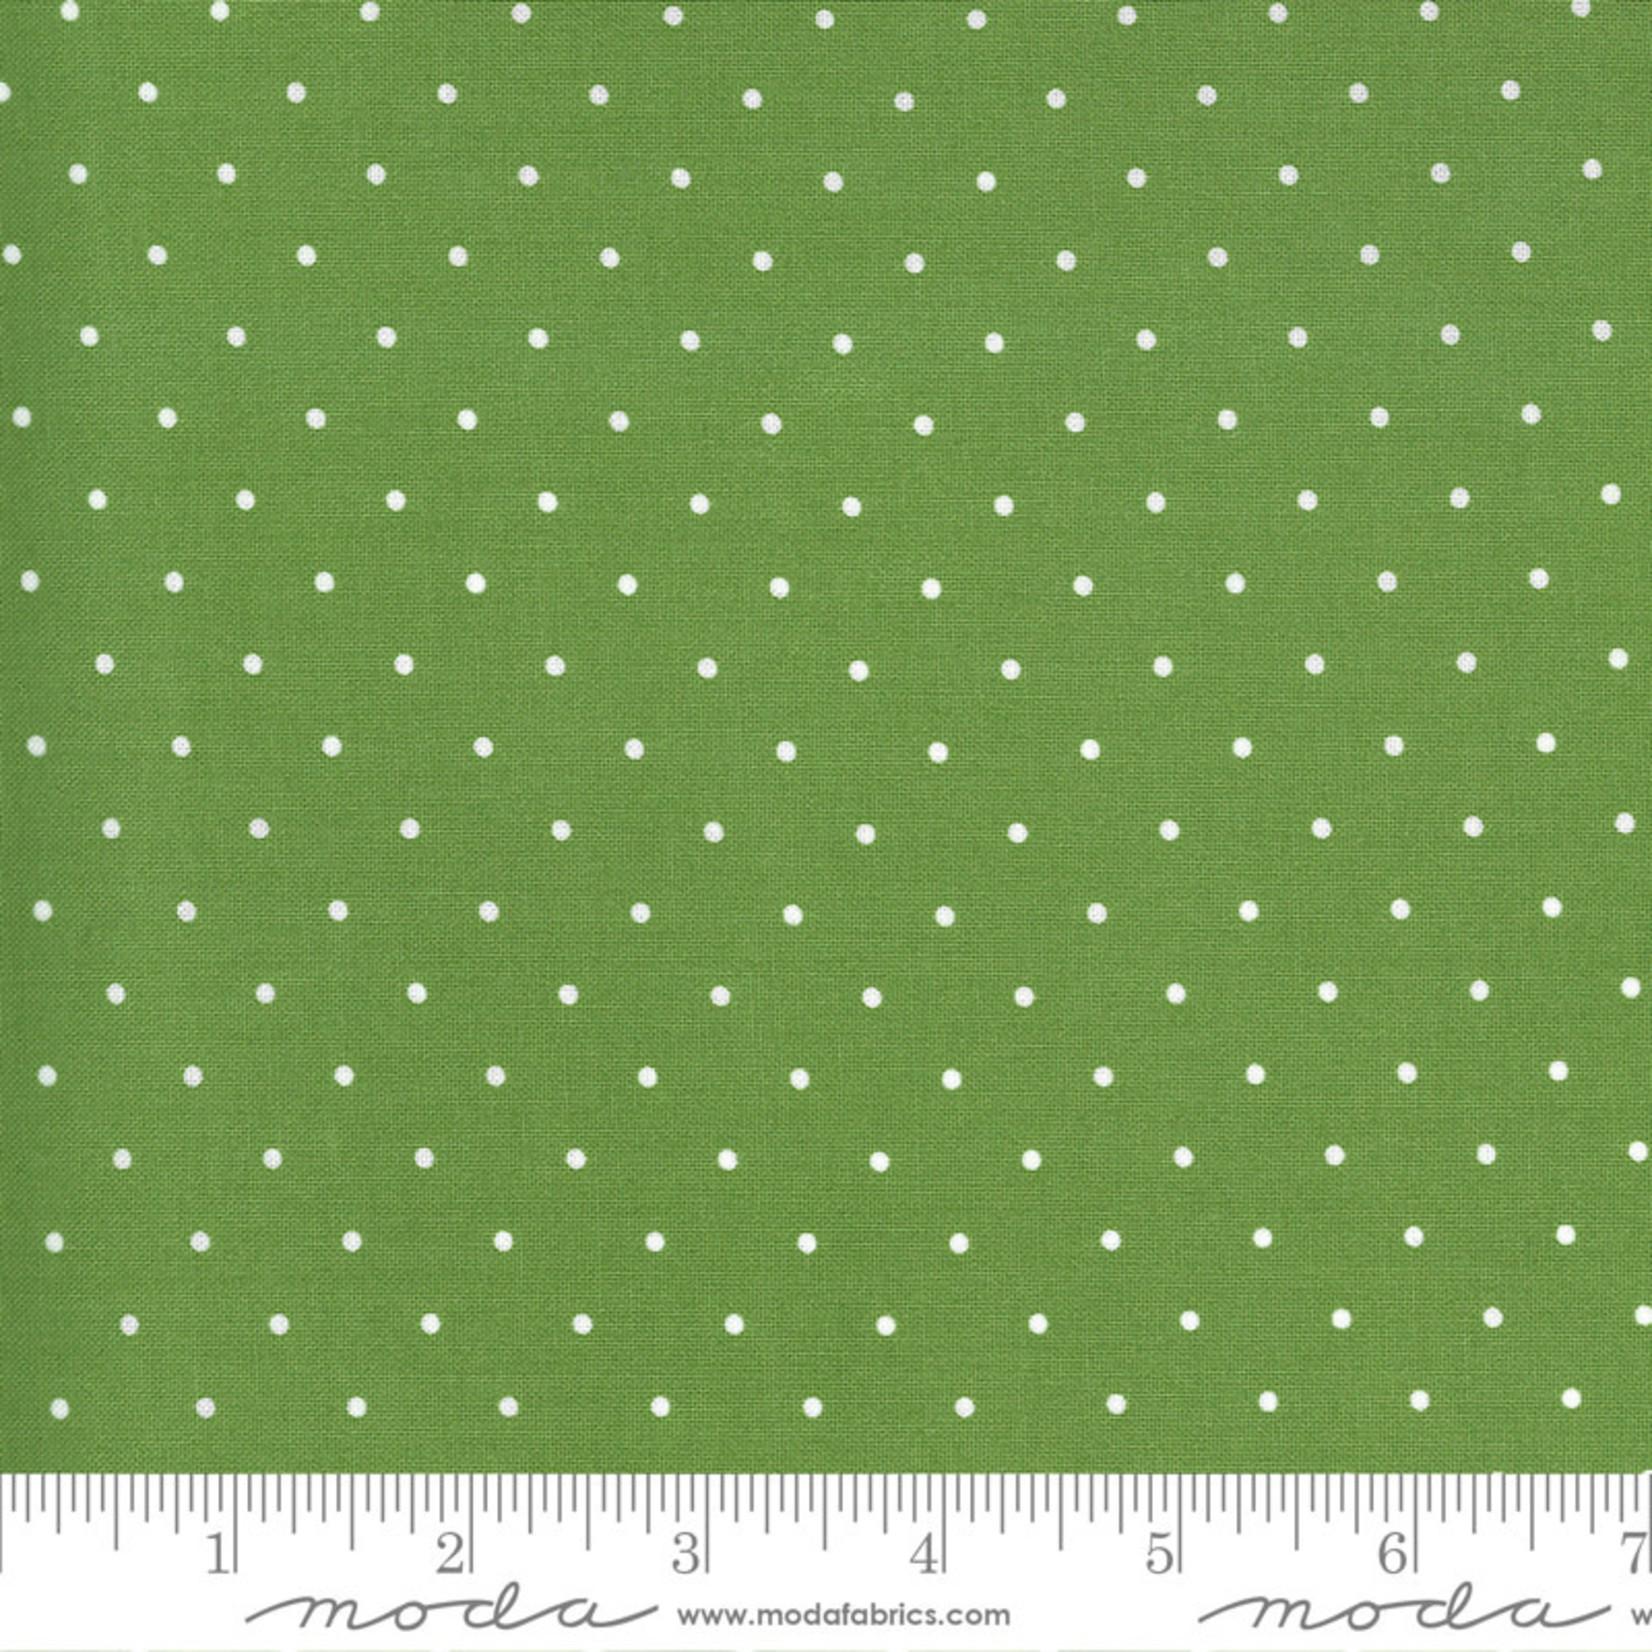 Bonnie & Camille Sunday Stroll, Sweet Dot, Green 55226 20 $0.20 per cm or $20/m